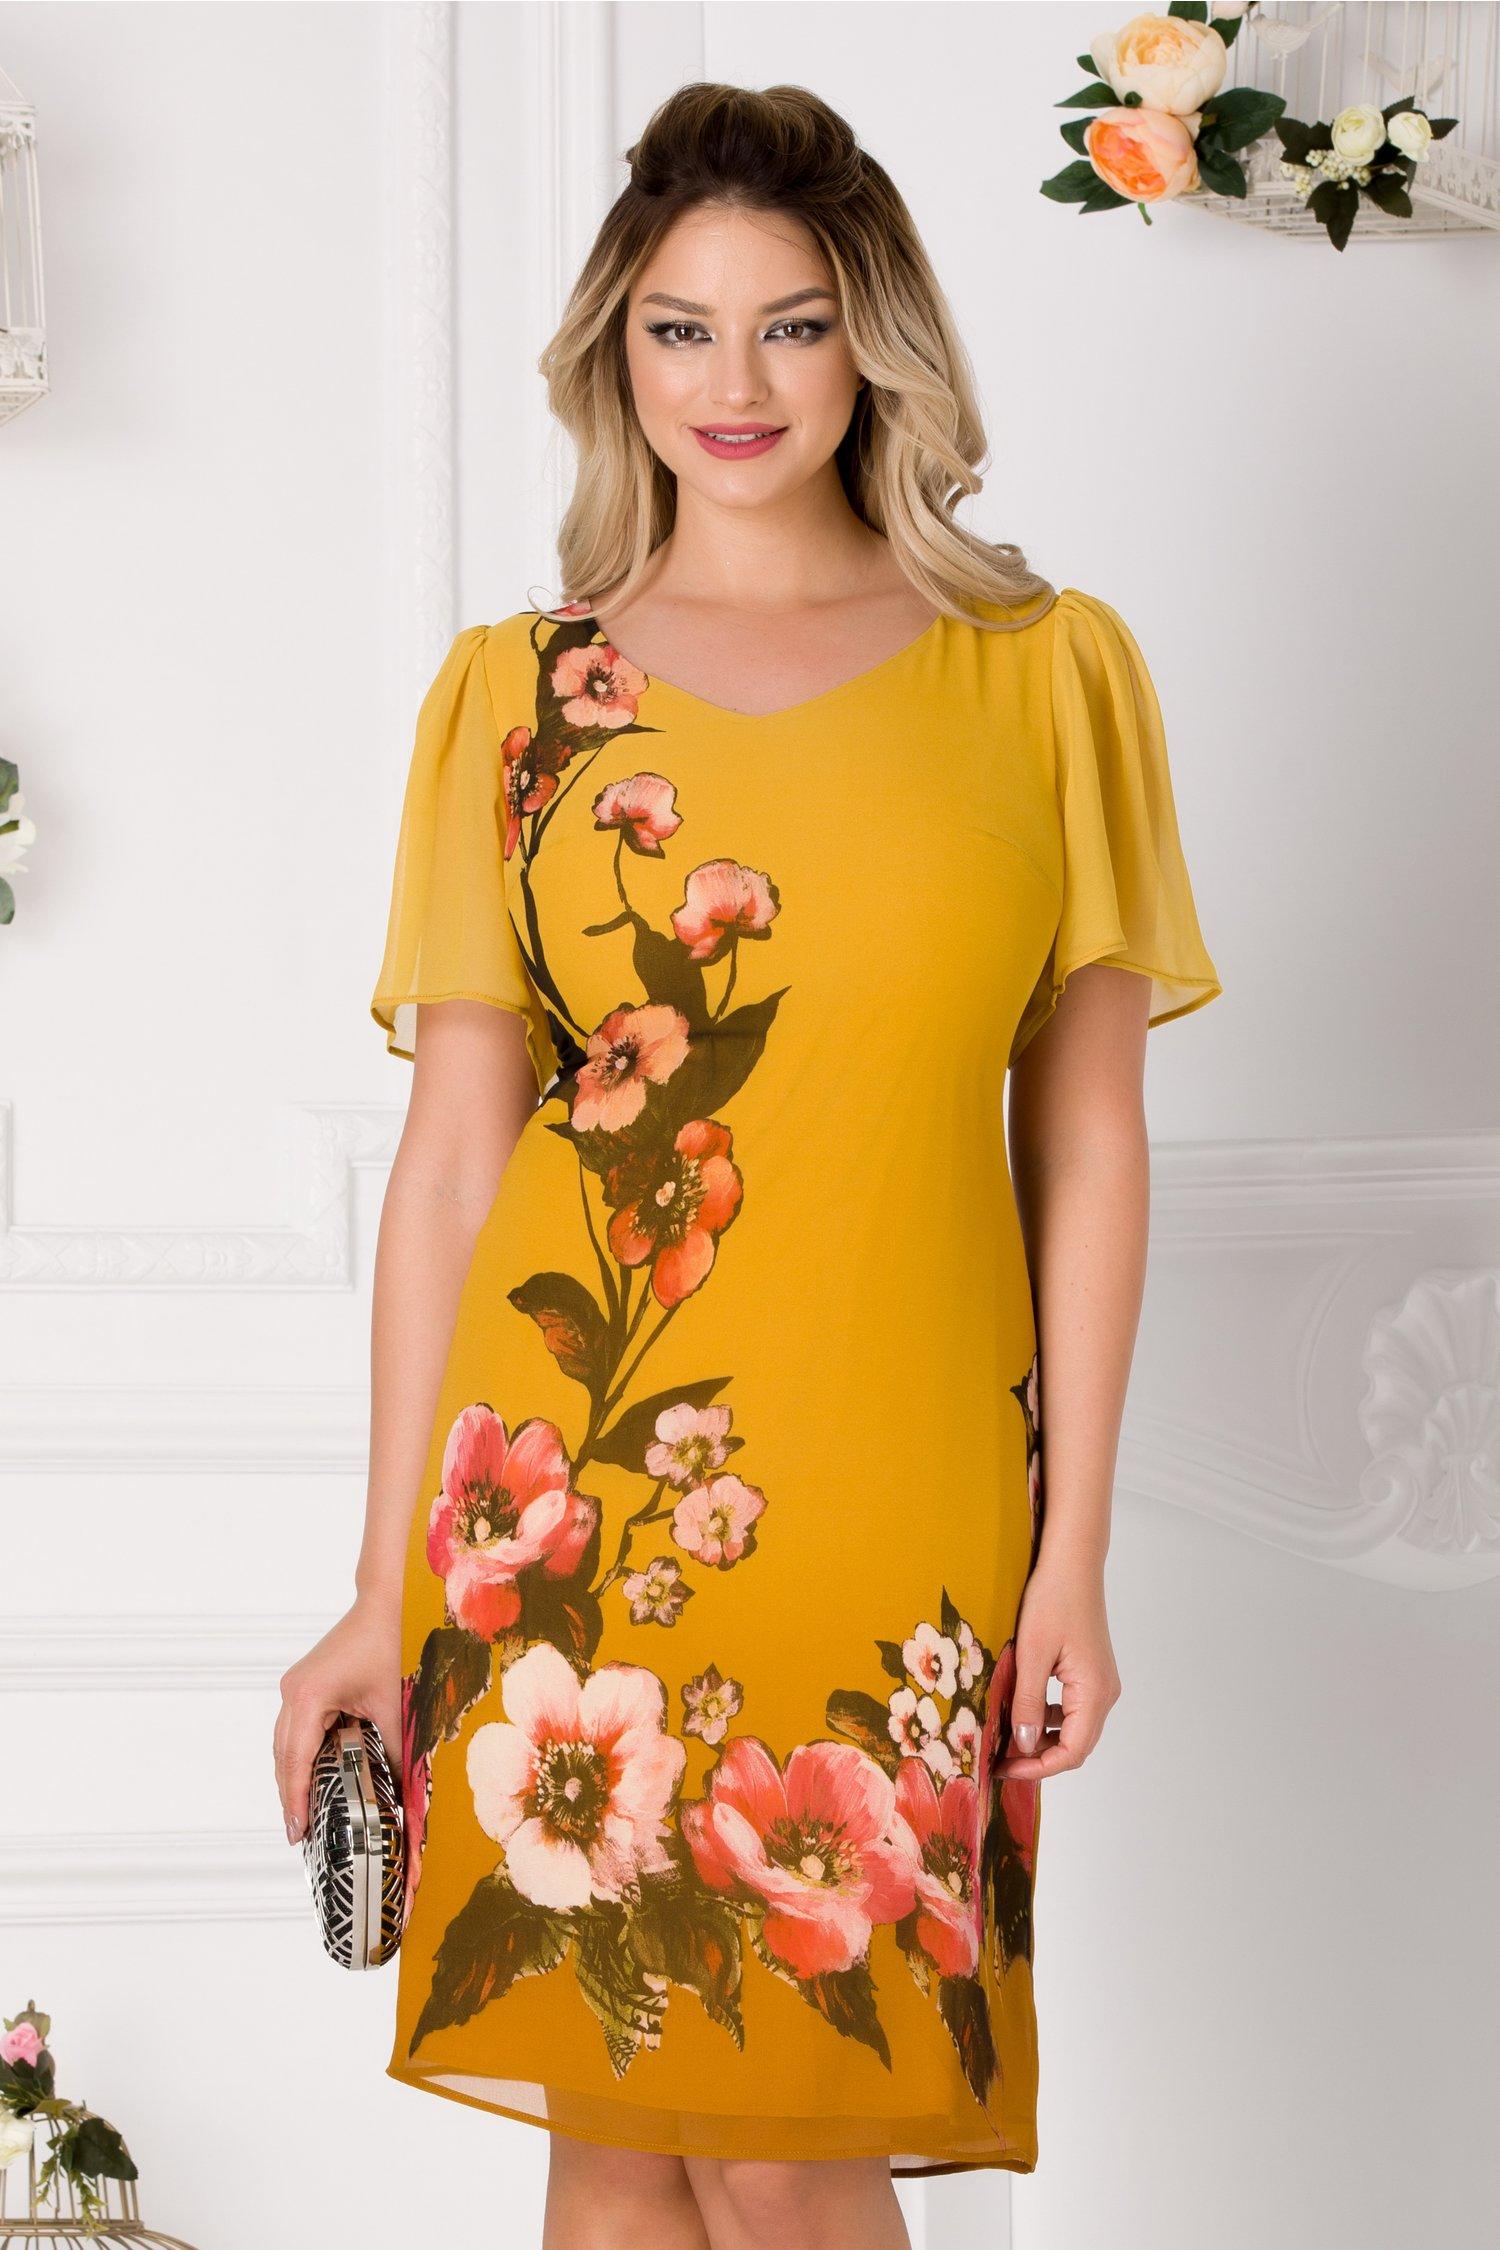 Rochie Leonard Collection galben mustar din voal cu imprimeu floral